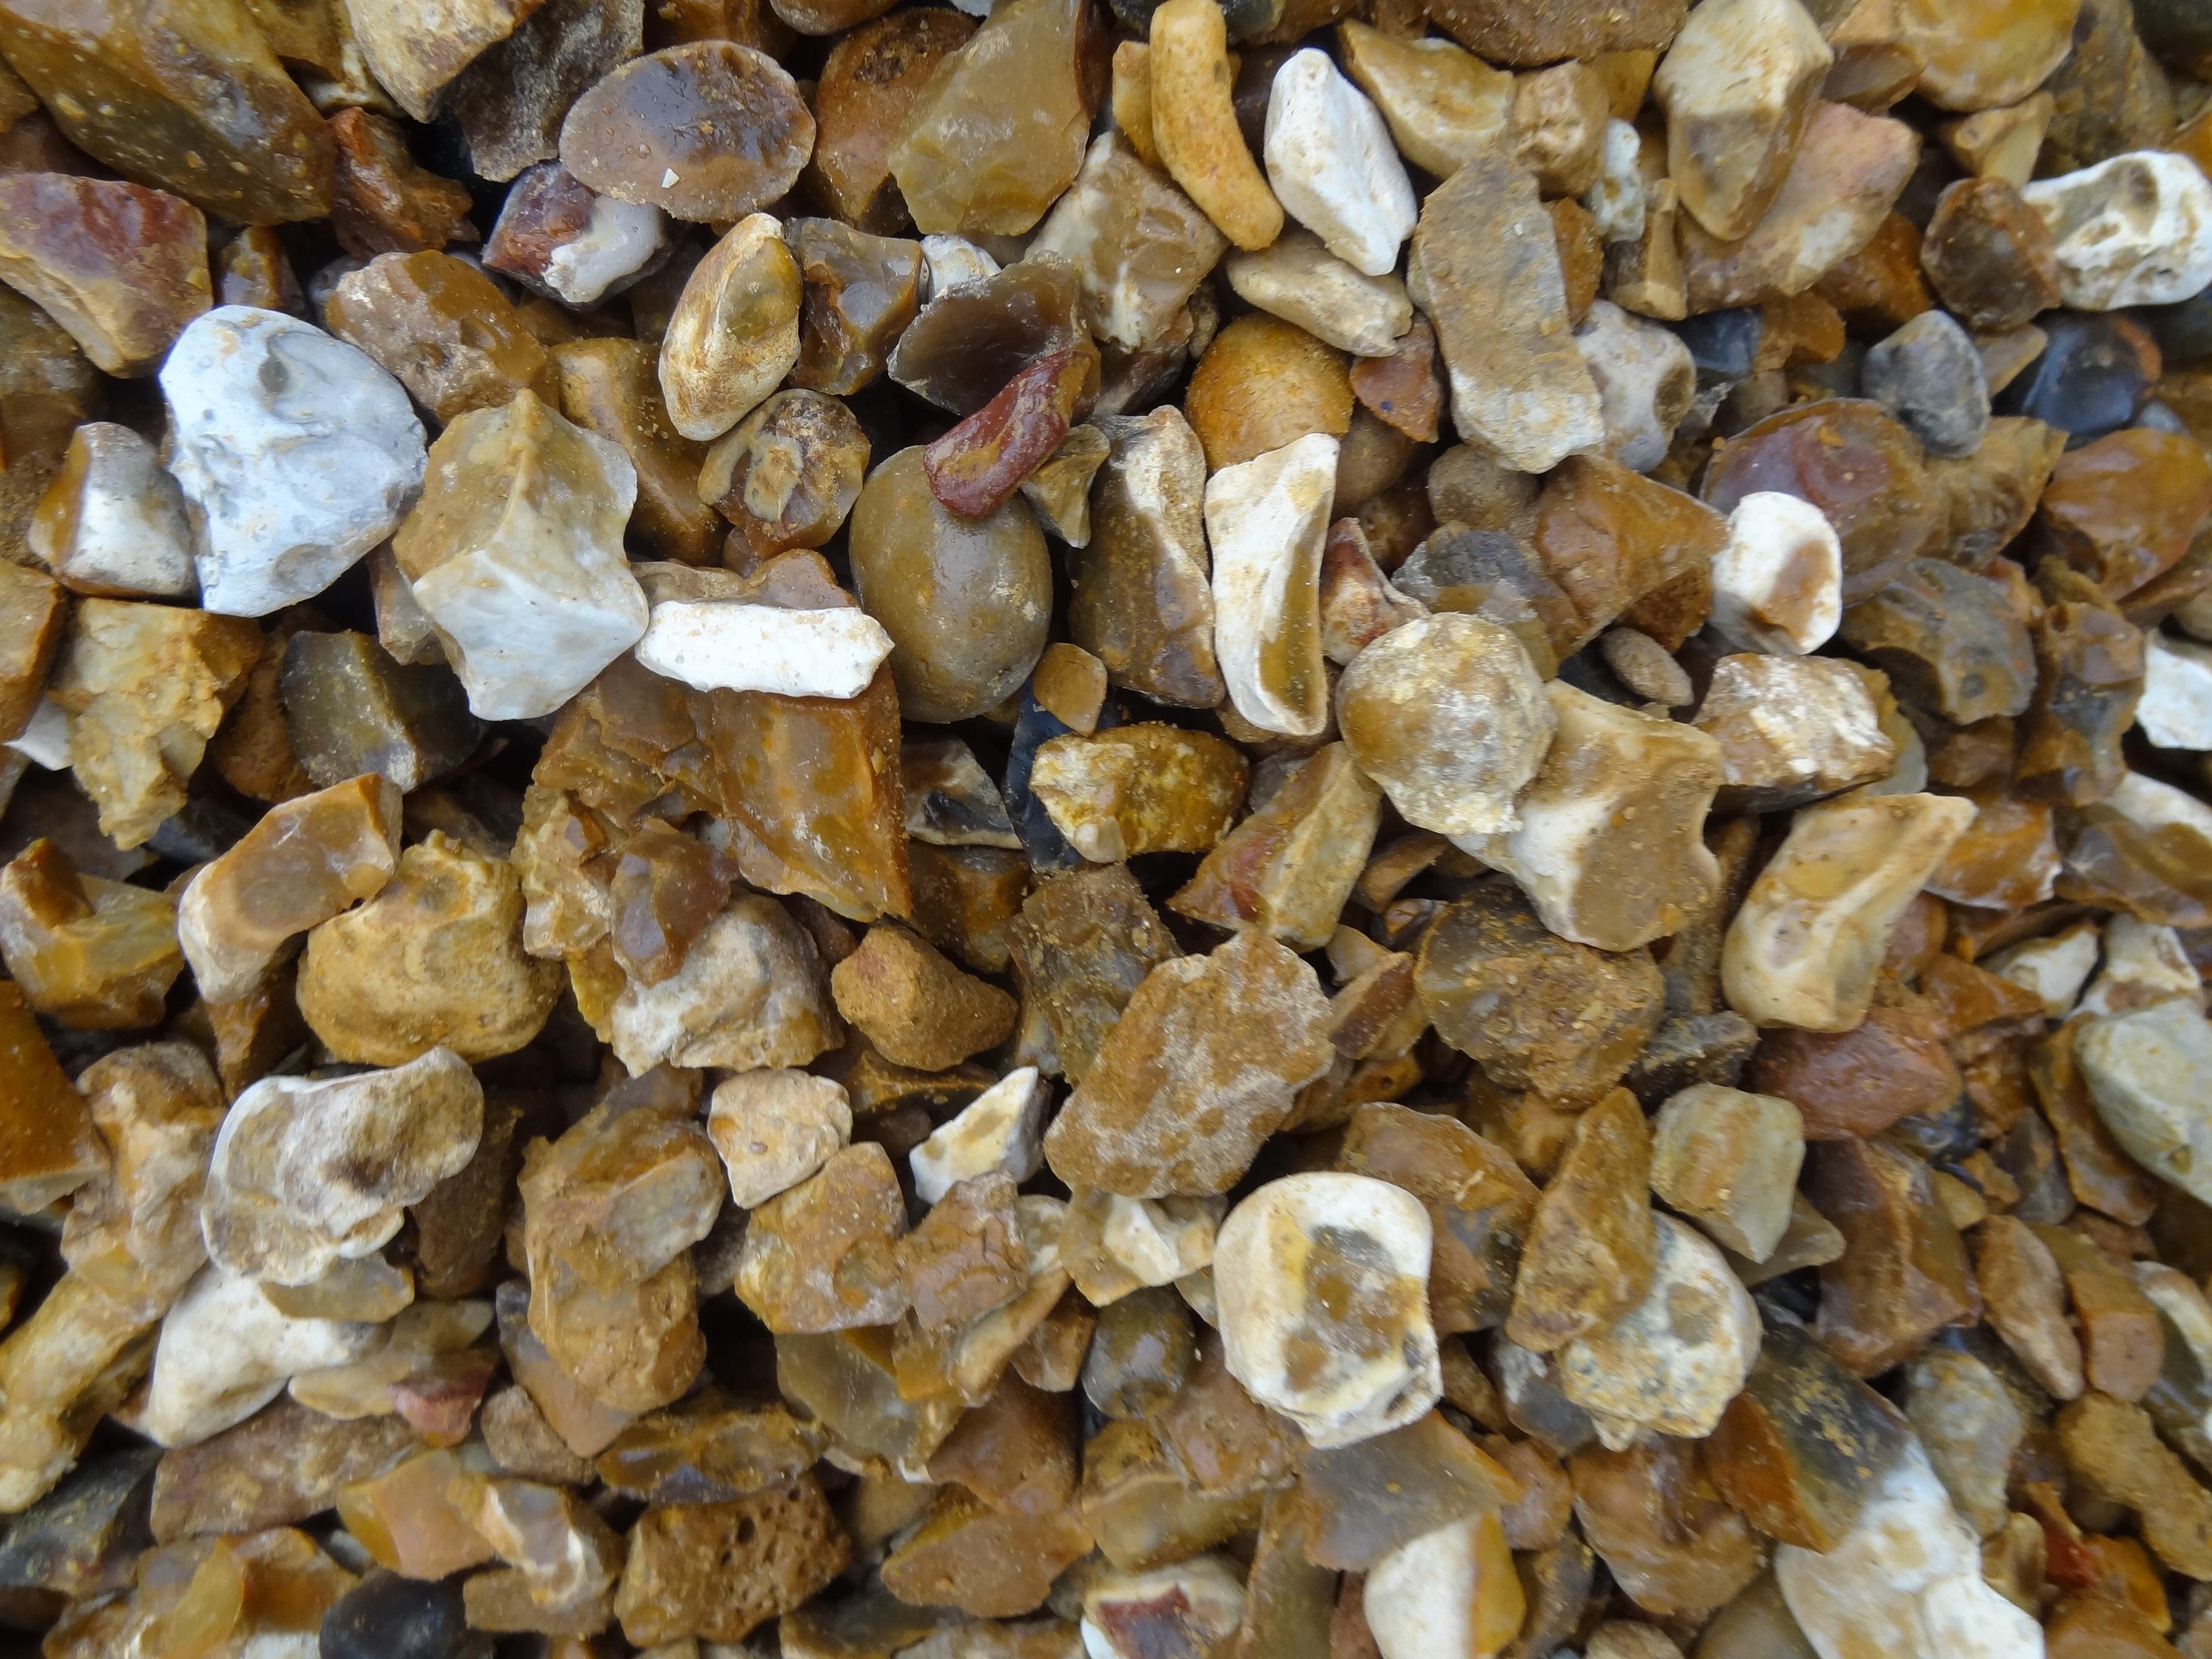 gardening decorative gravel image dorset pak decor deco bark pebbles outdoors